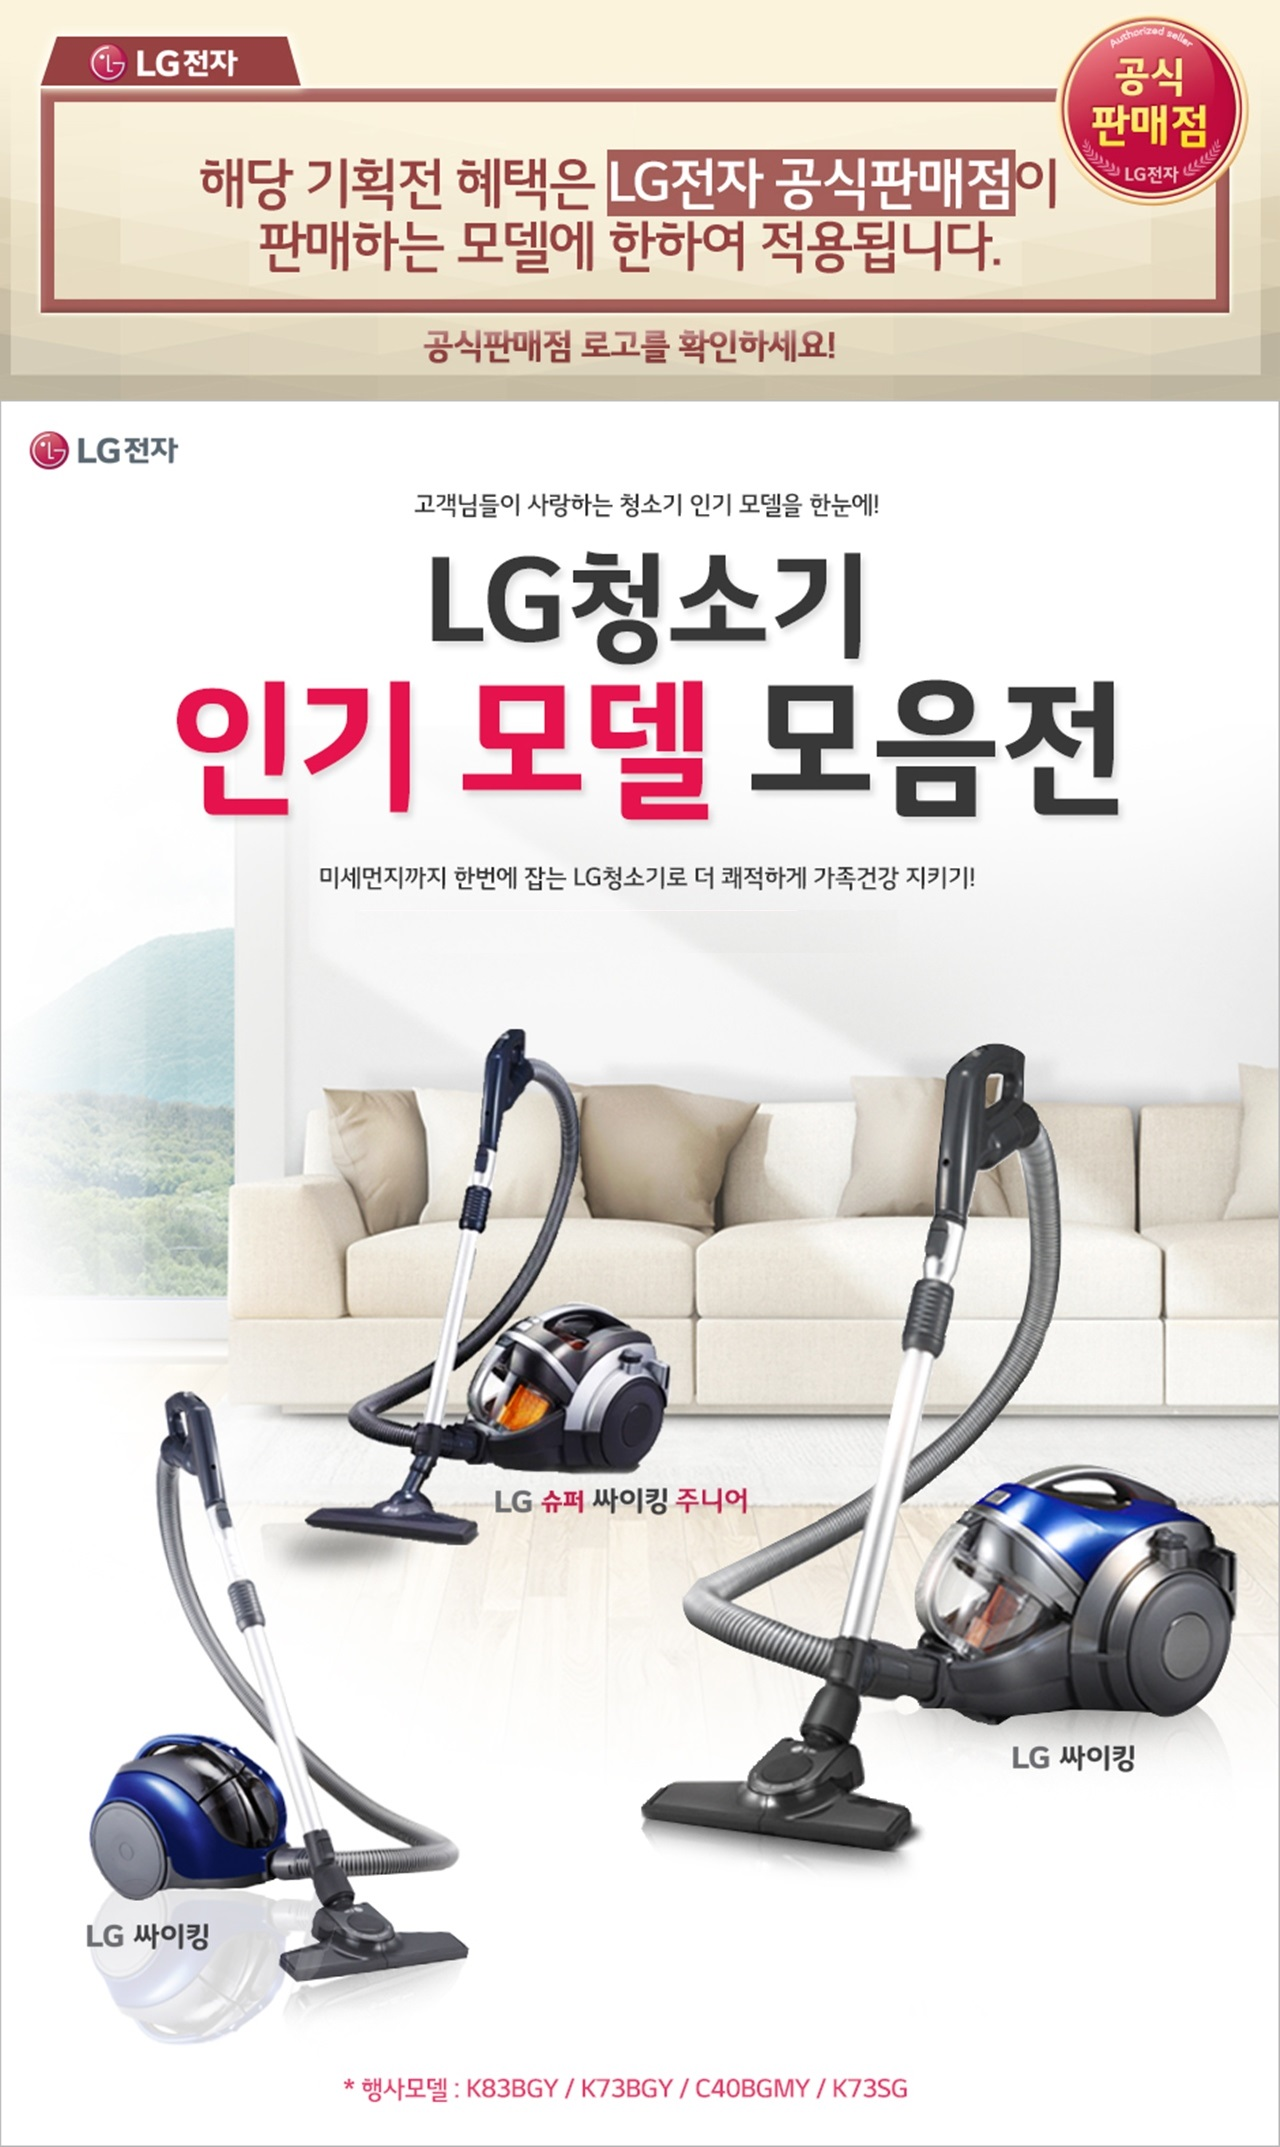 [LG전자] 청소기 인기모델 모음전